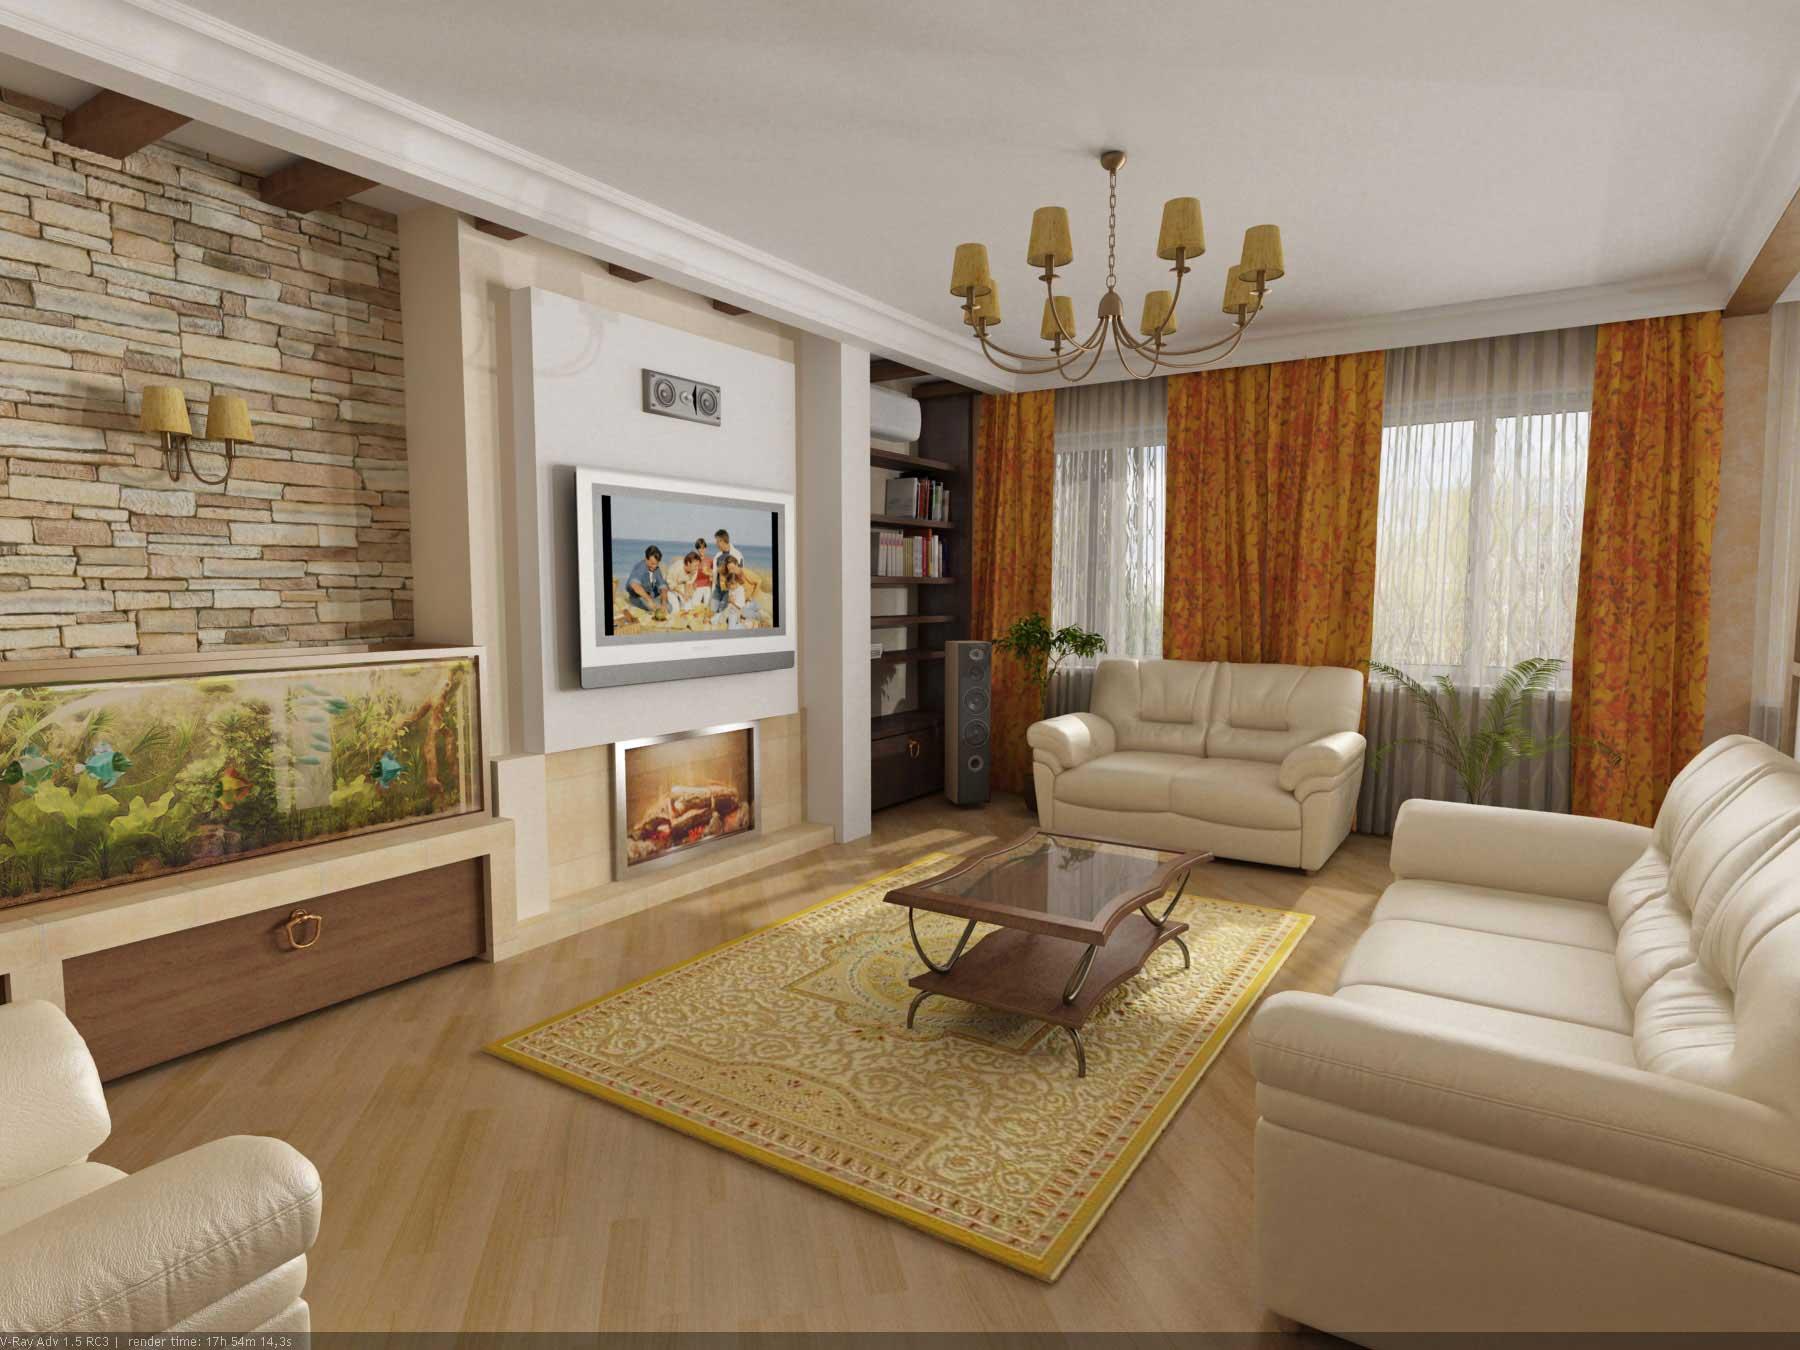 Квартирные залы дизайн